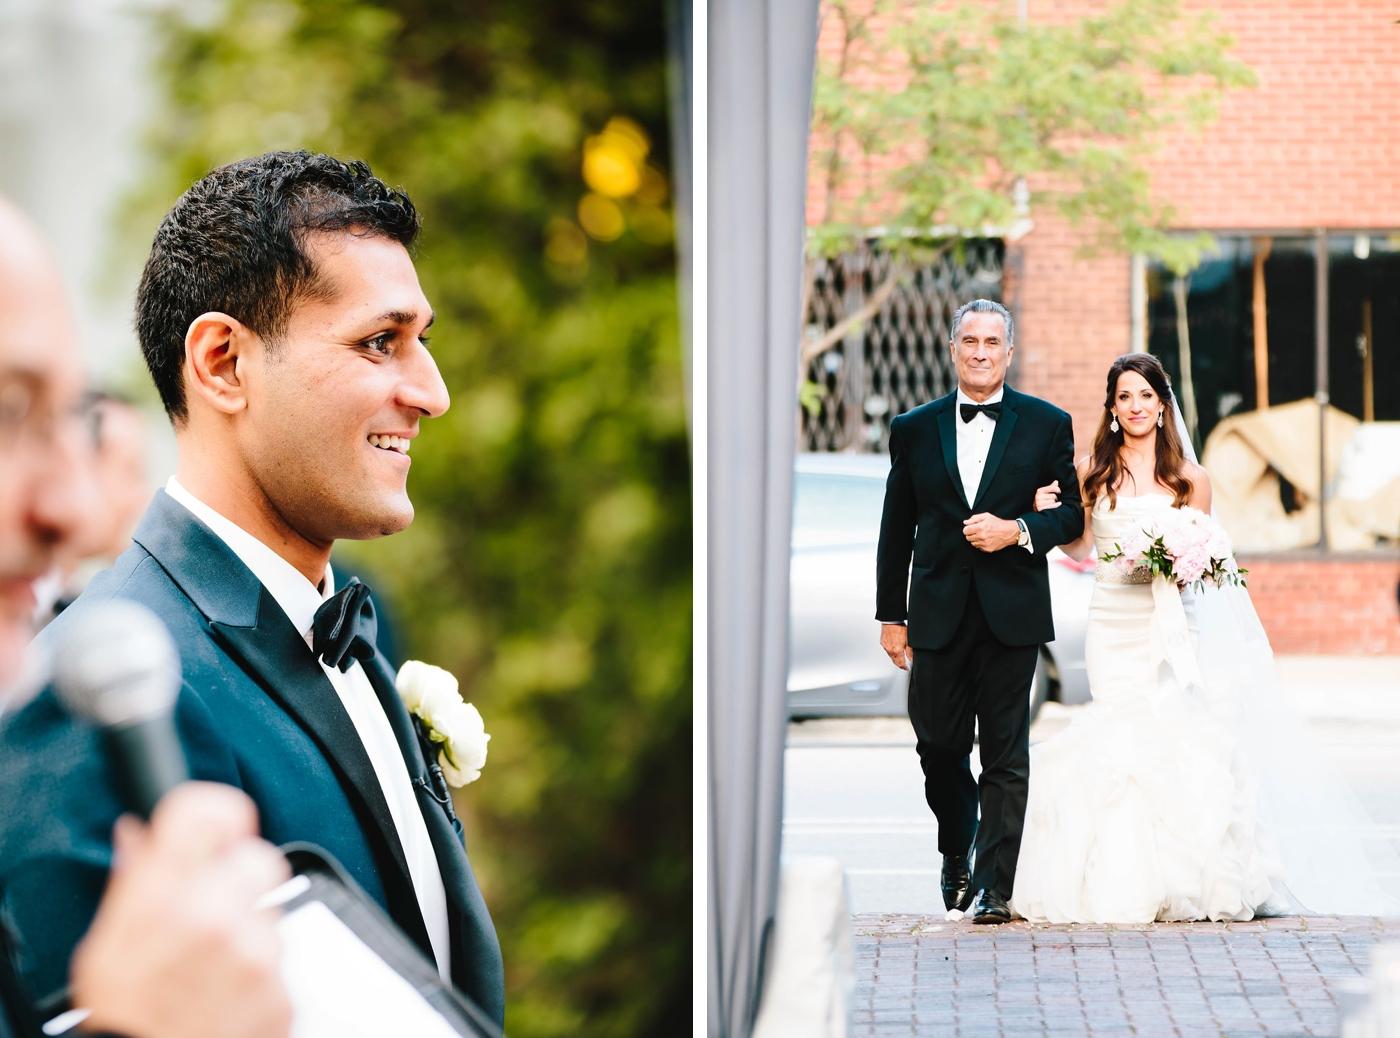 chicago-fine-art-wedding-photography-sakamuri51